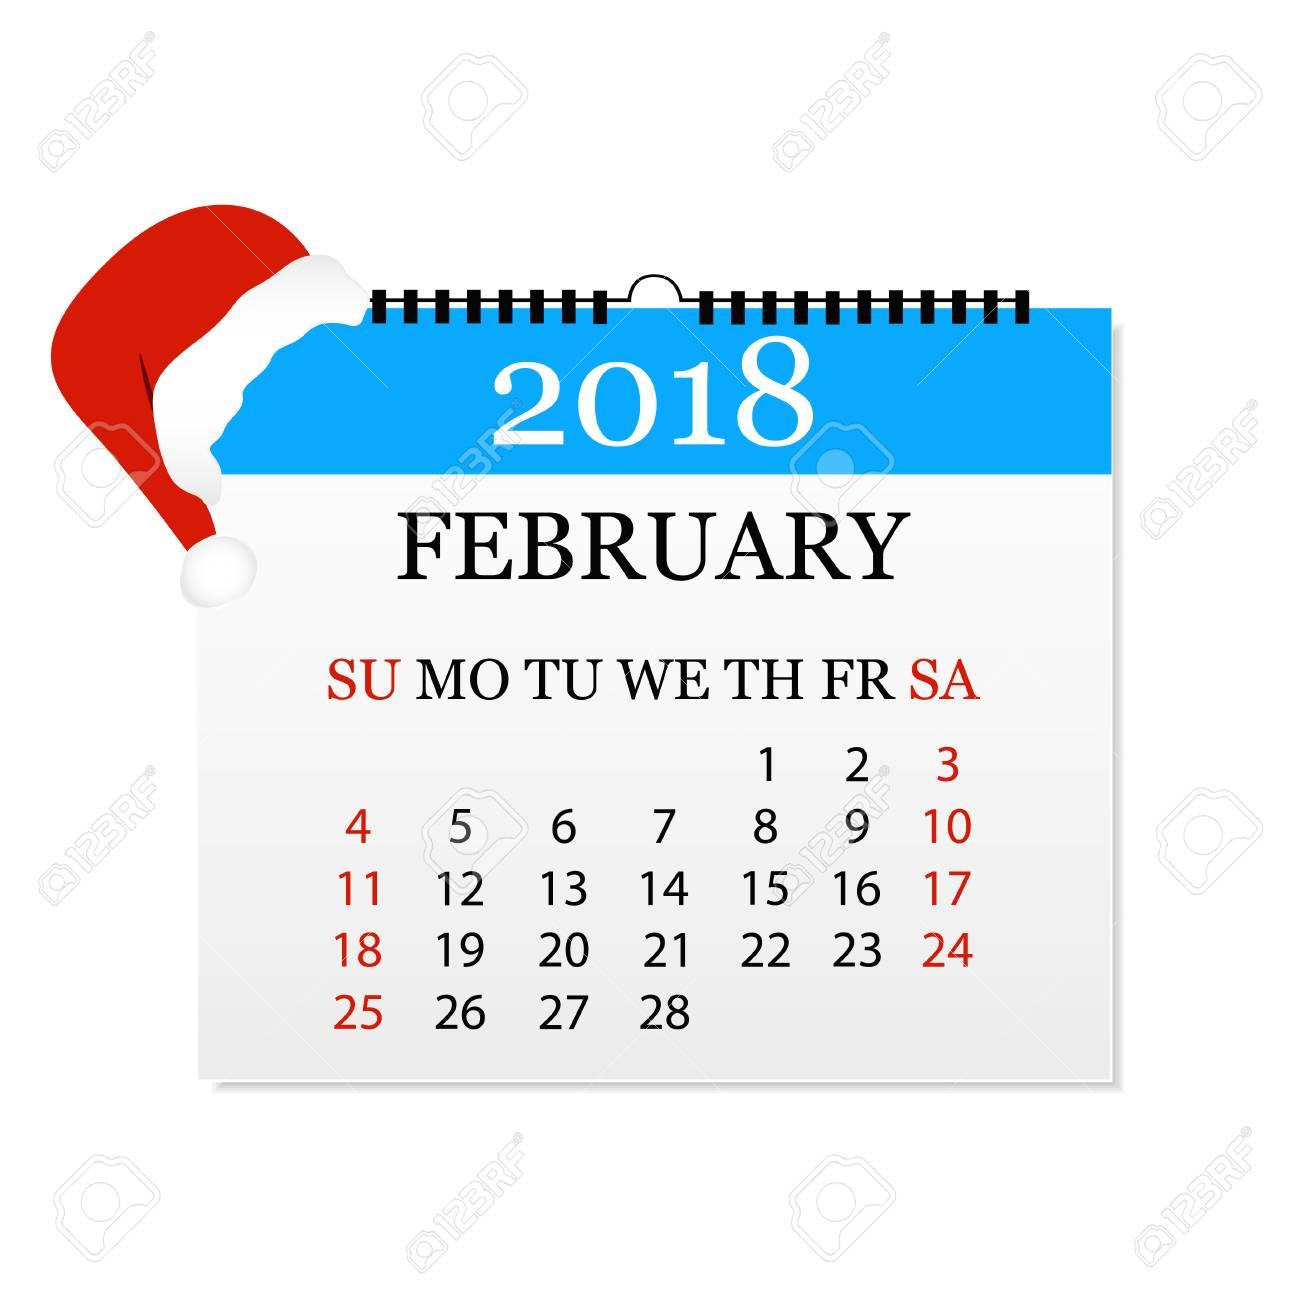 monthly calendar 2018 tear off calendar for february white background vector illustration